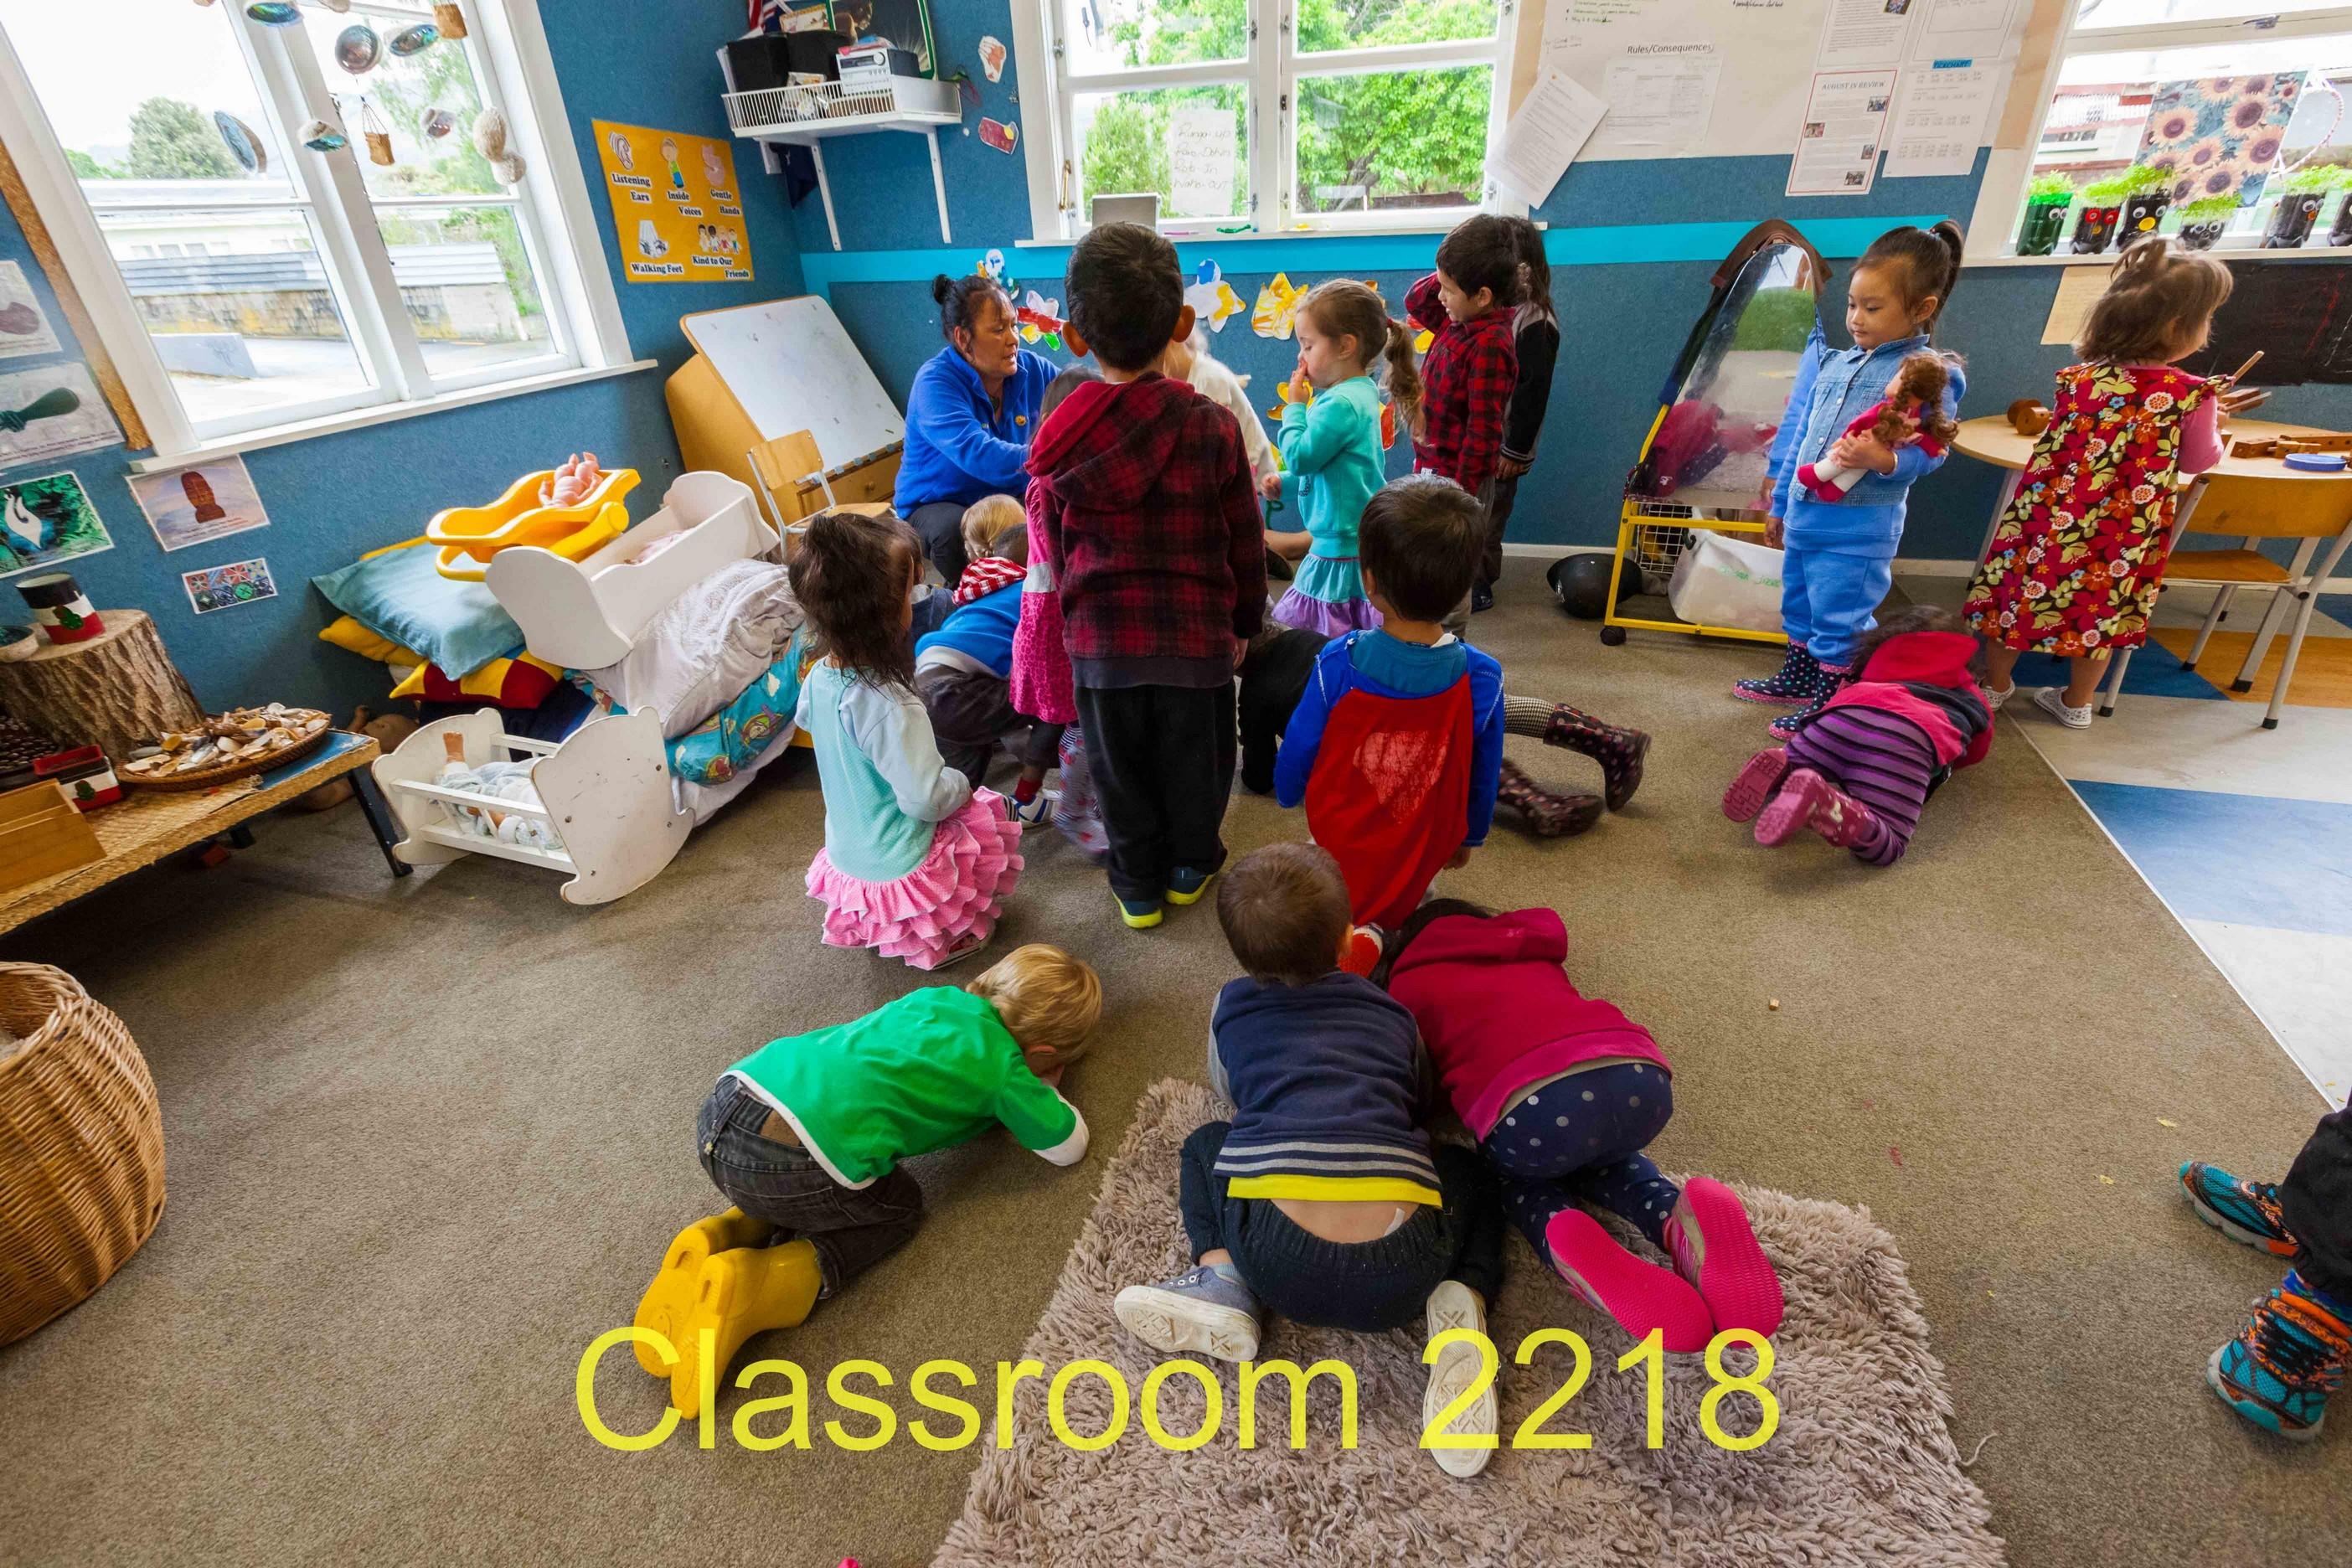 Classroom 2218